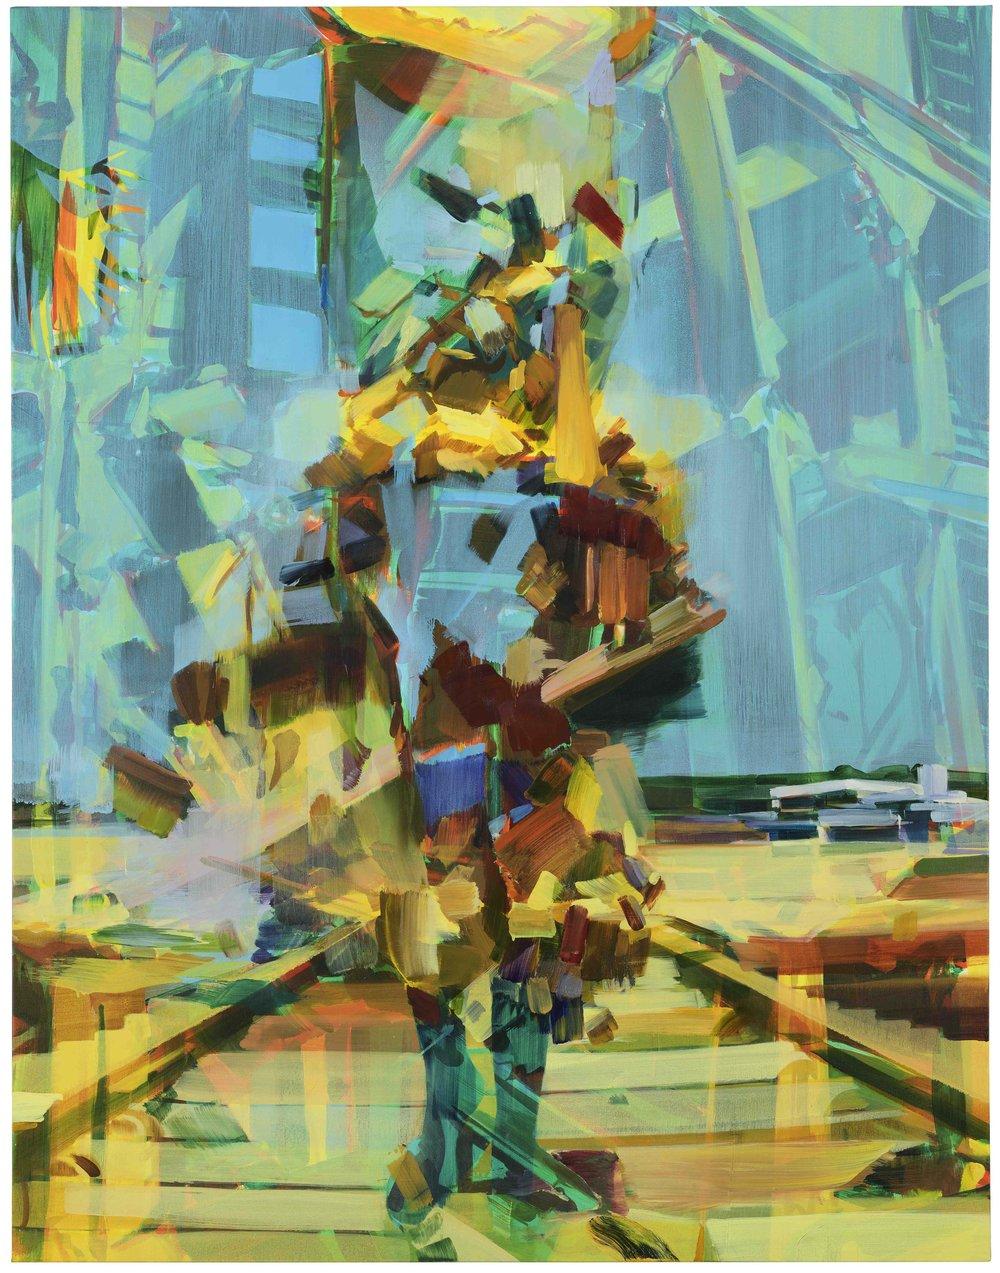 Self construct (Zimbabwe undertones) , November 2017, oil on canvas,183 x 143cm